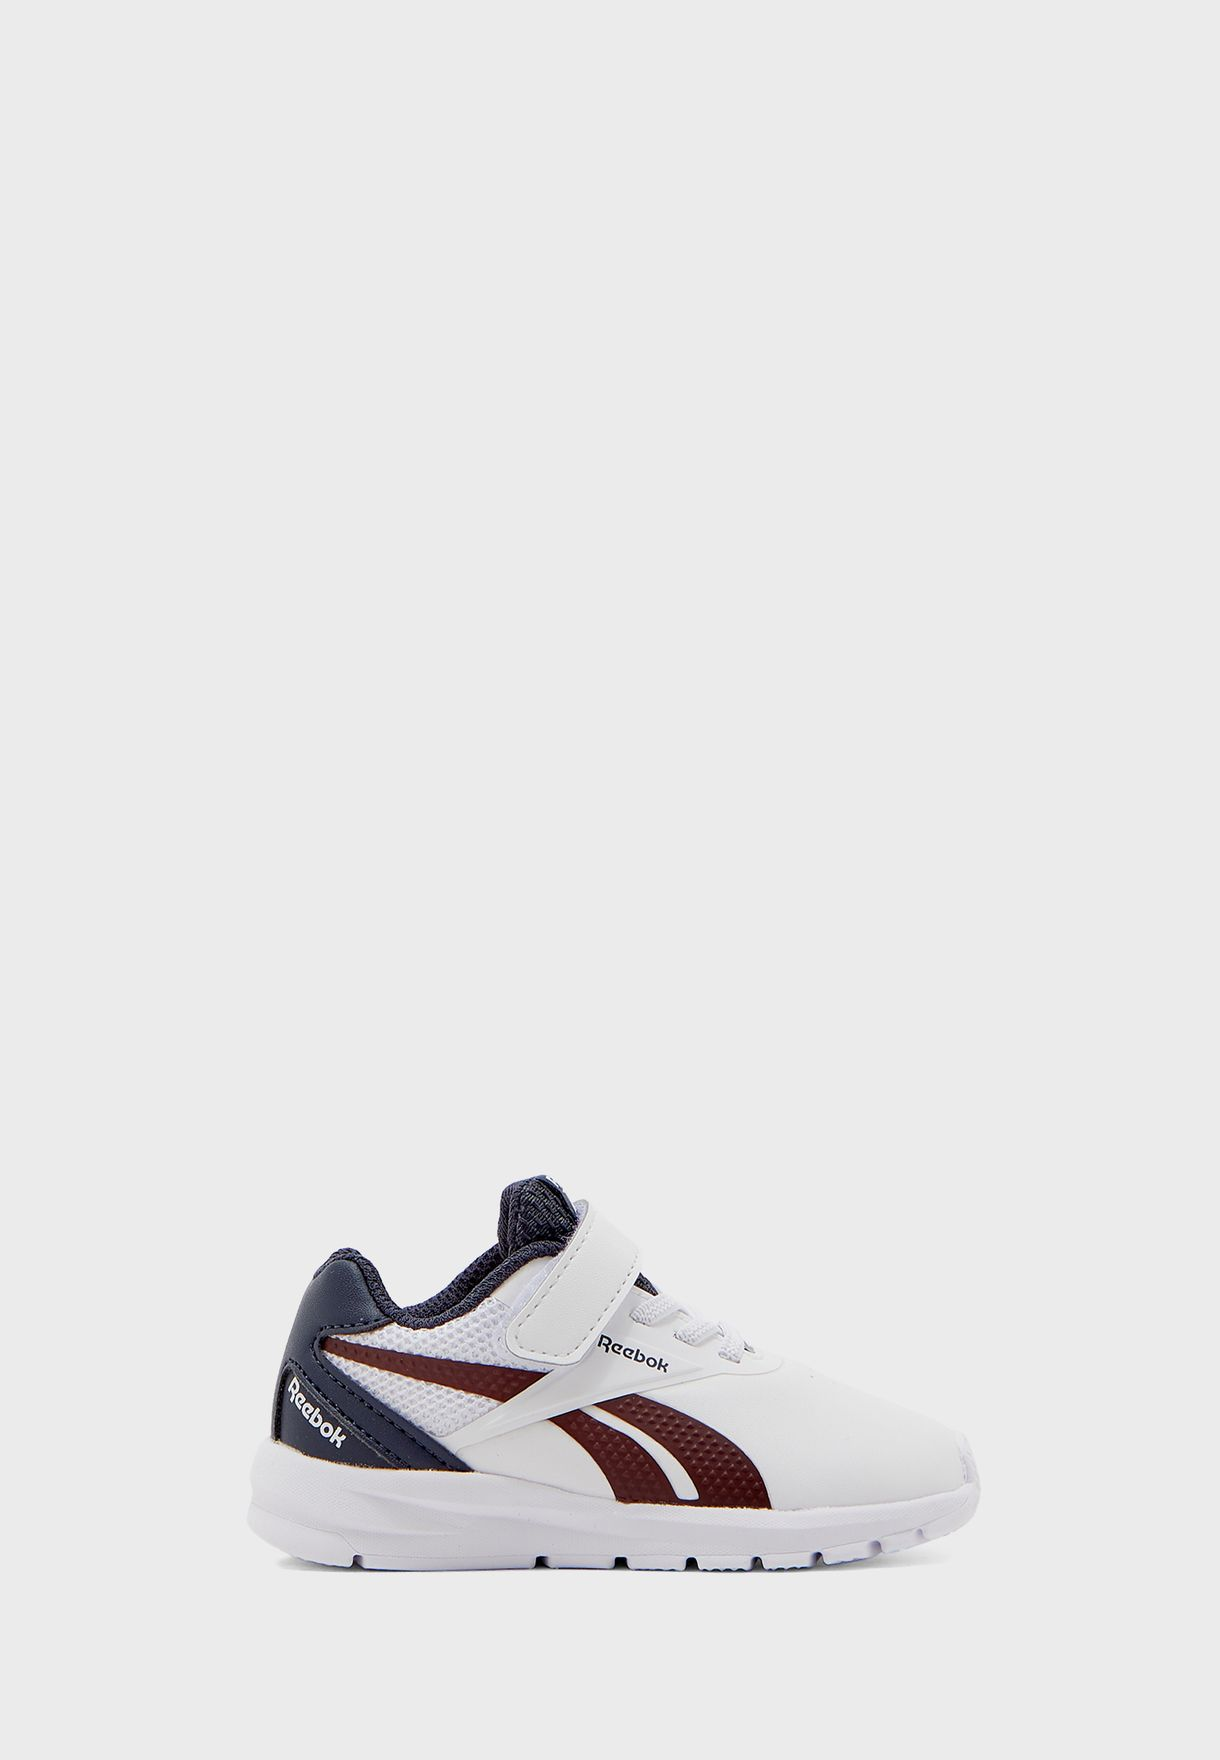 حذاء رش رنر 2.0 اس واي ان